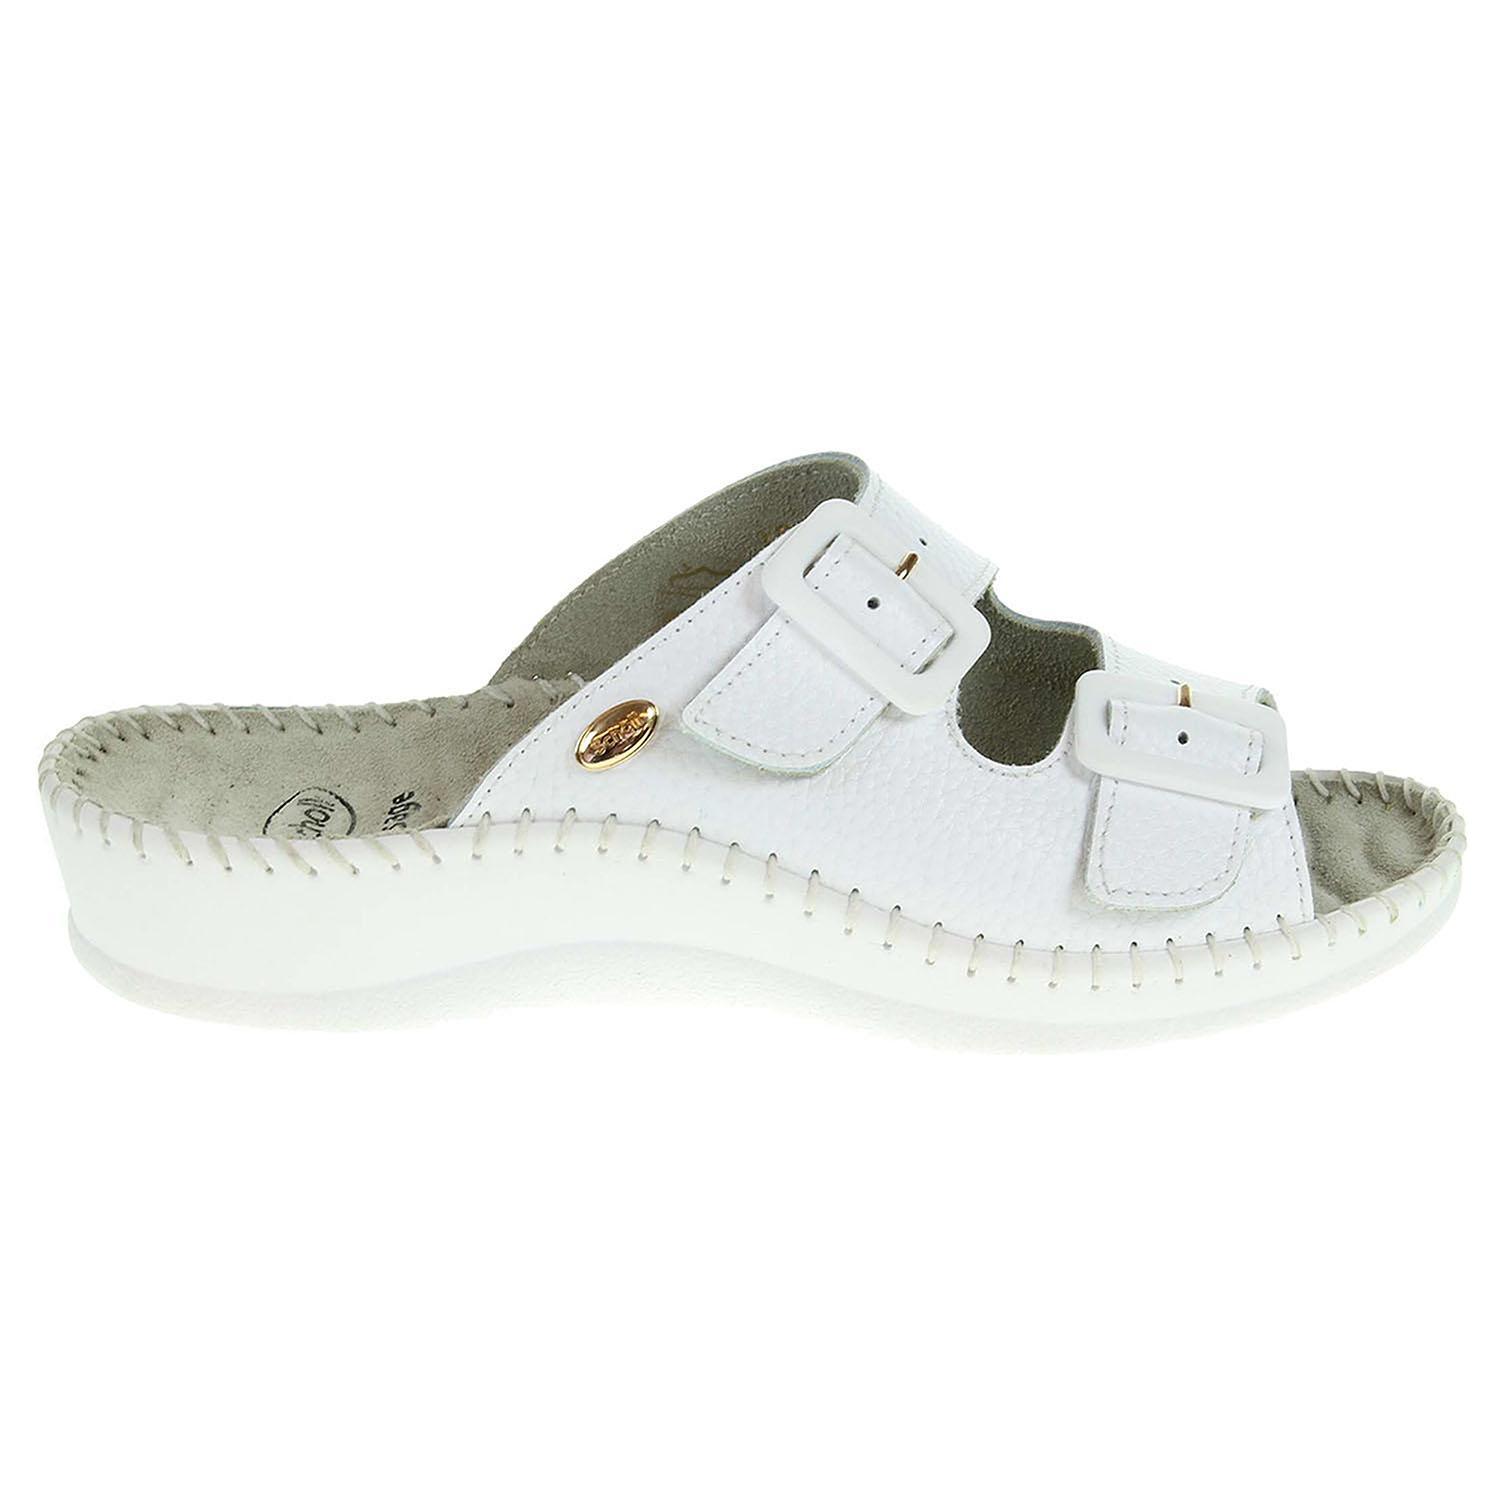 Ecco Scholl dámské pantofle F20067 1065 Weekend bílé 23400331